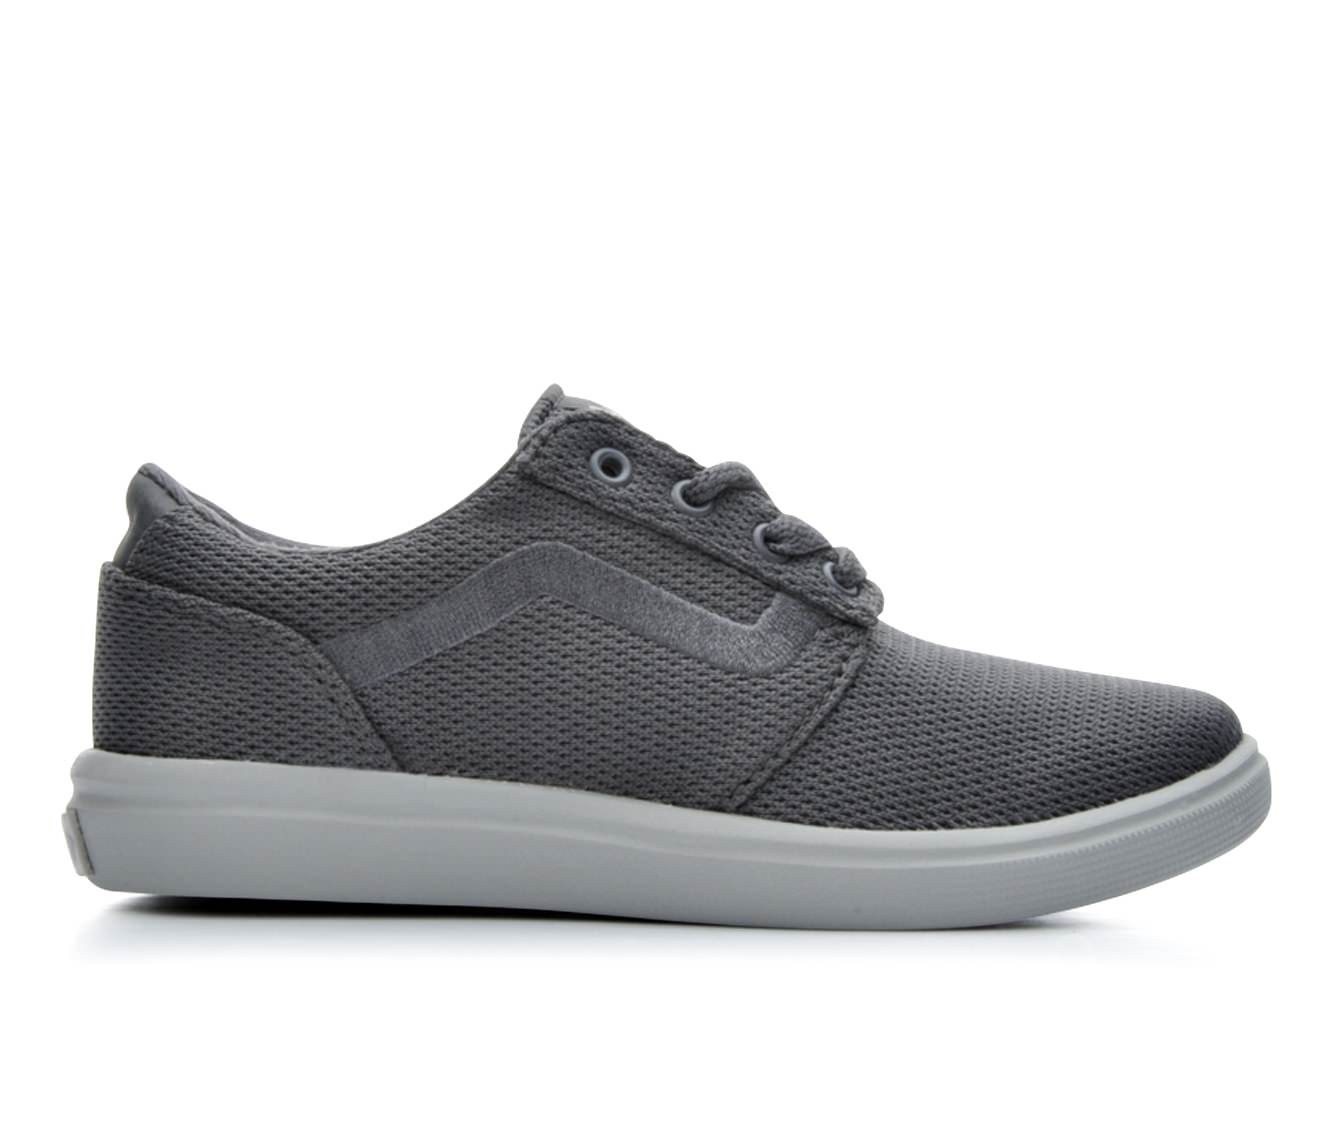 Boys' Vans Chapman Lite Skate Shoes (Grey)